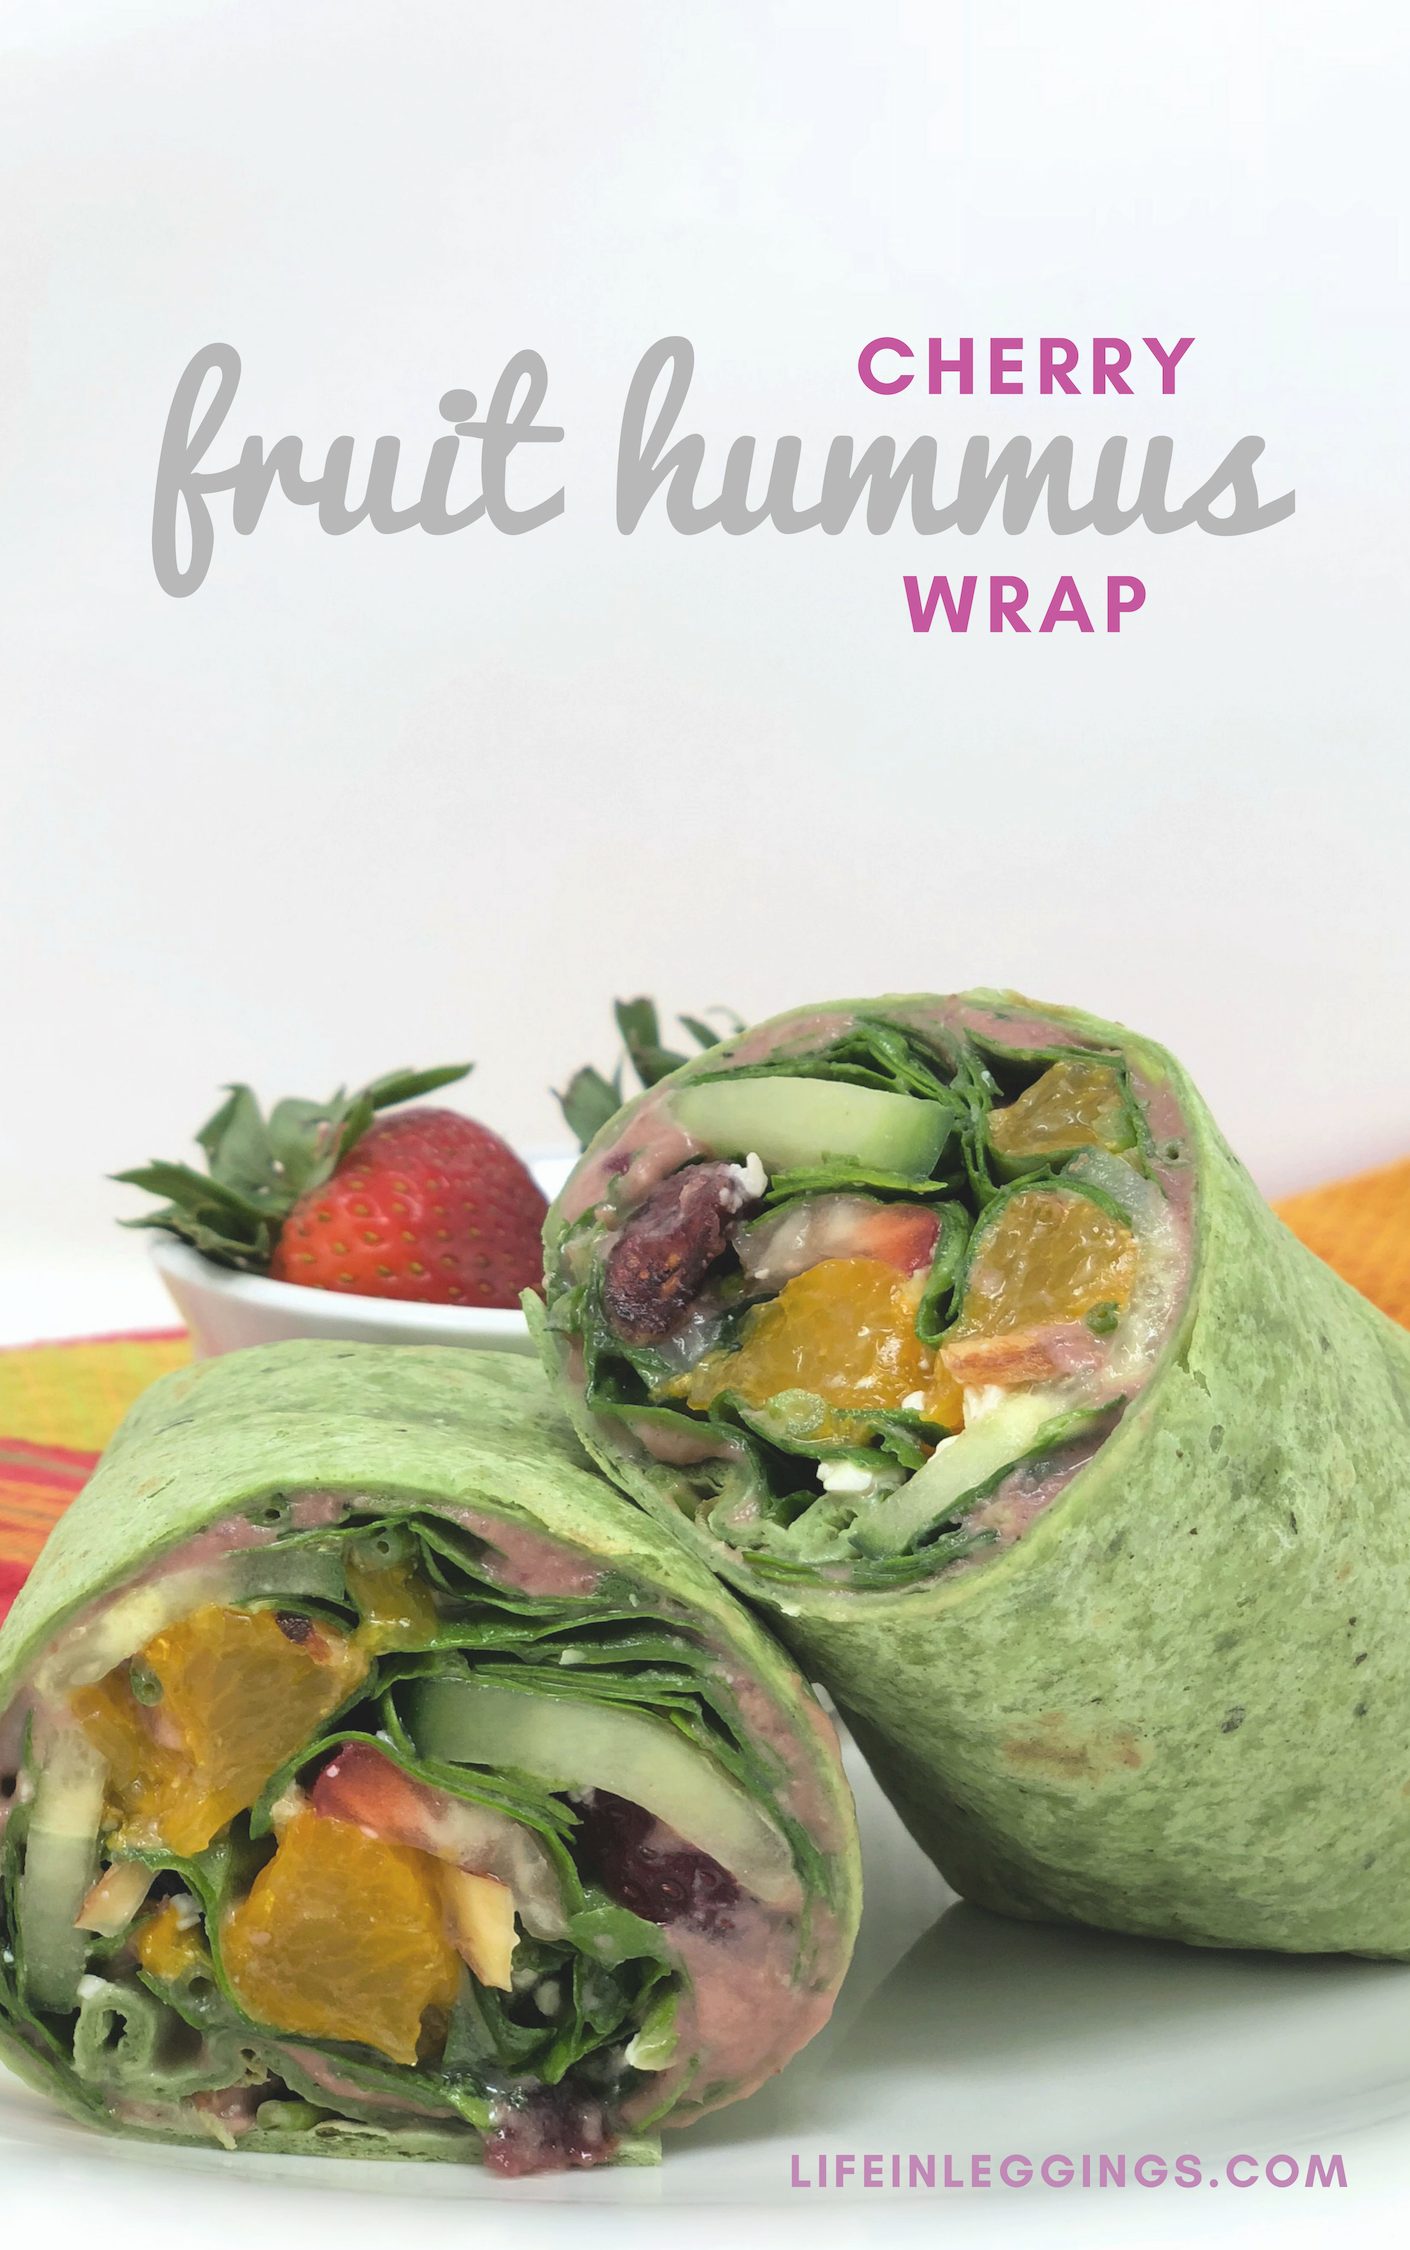 Cherry Fruit Hummus Wrap - Life In Leggings Lantana Hummus